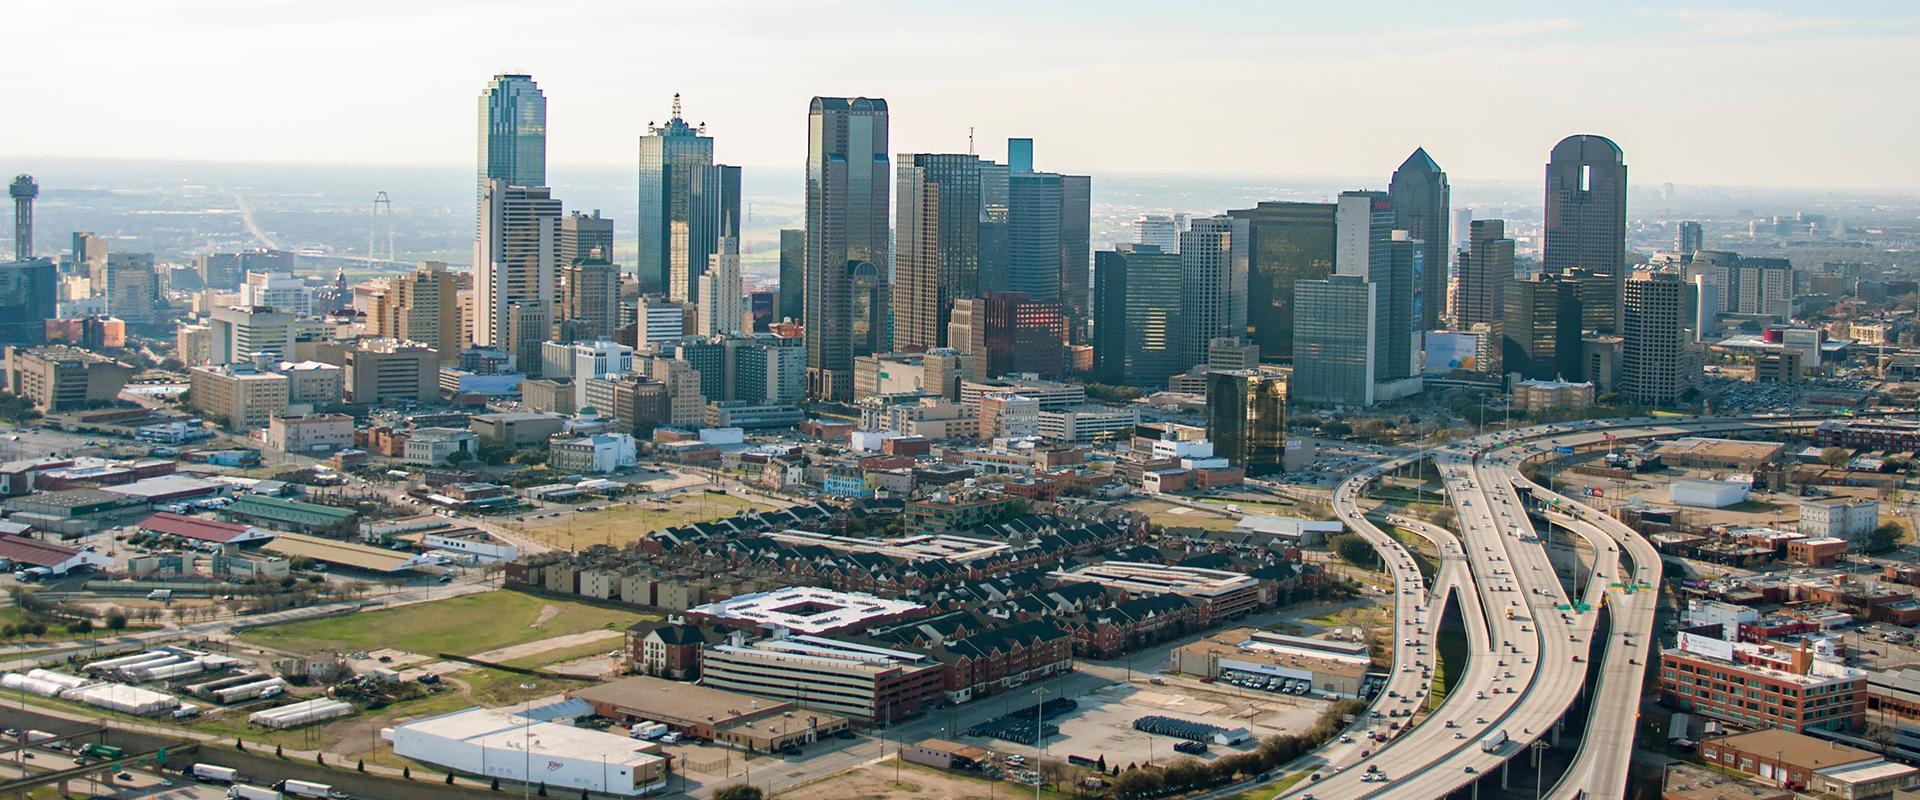 aerial view of dallas tx